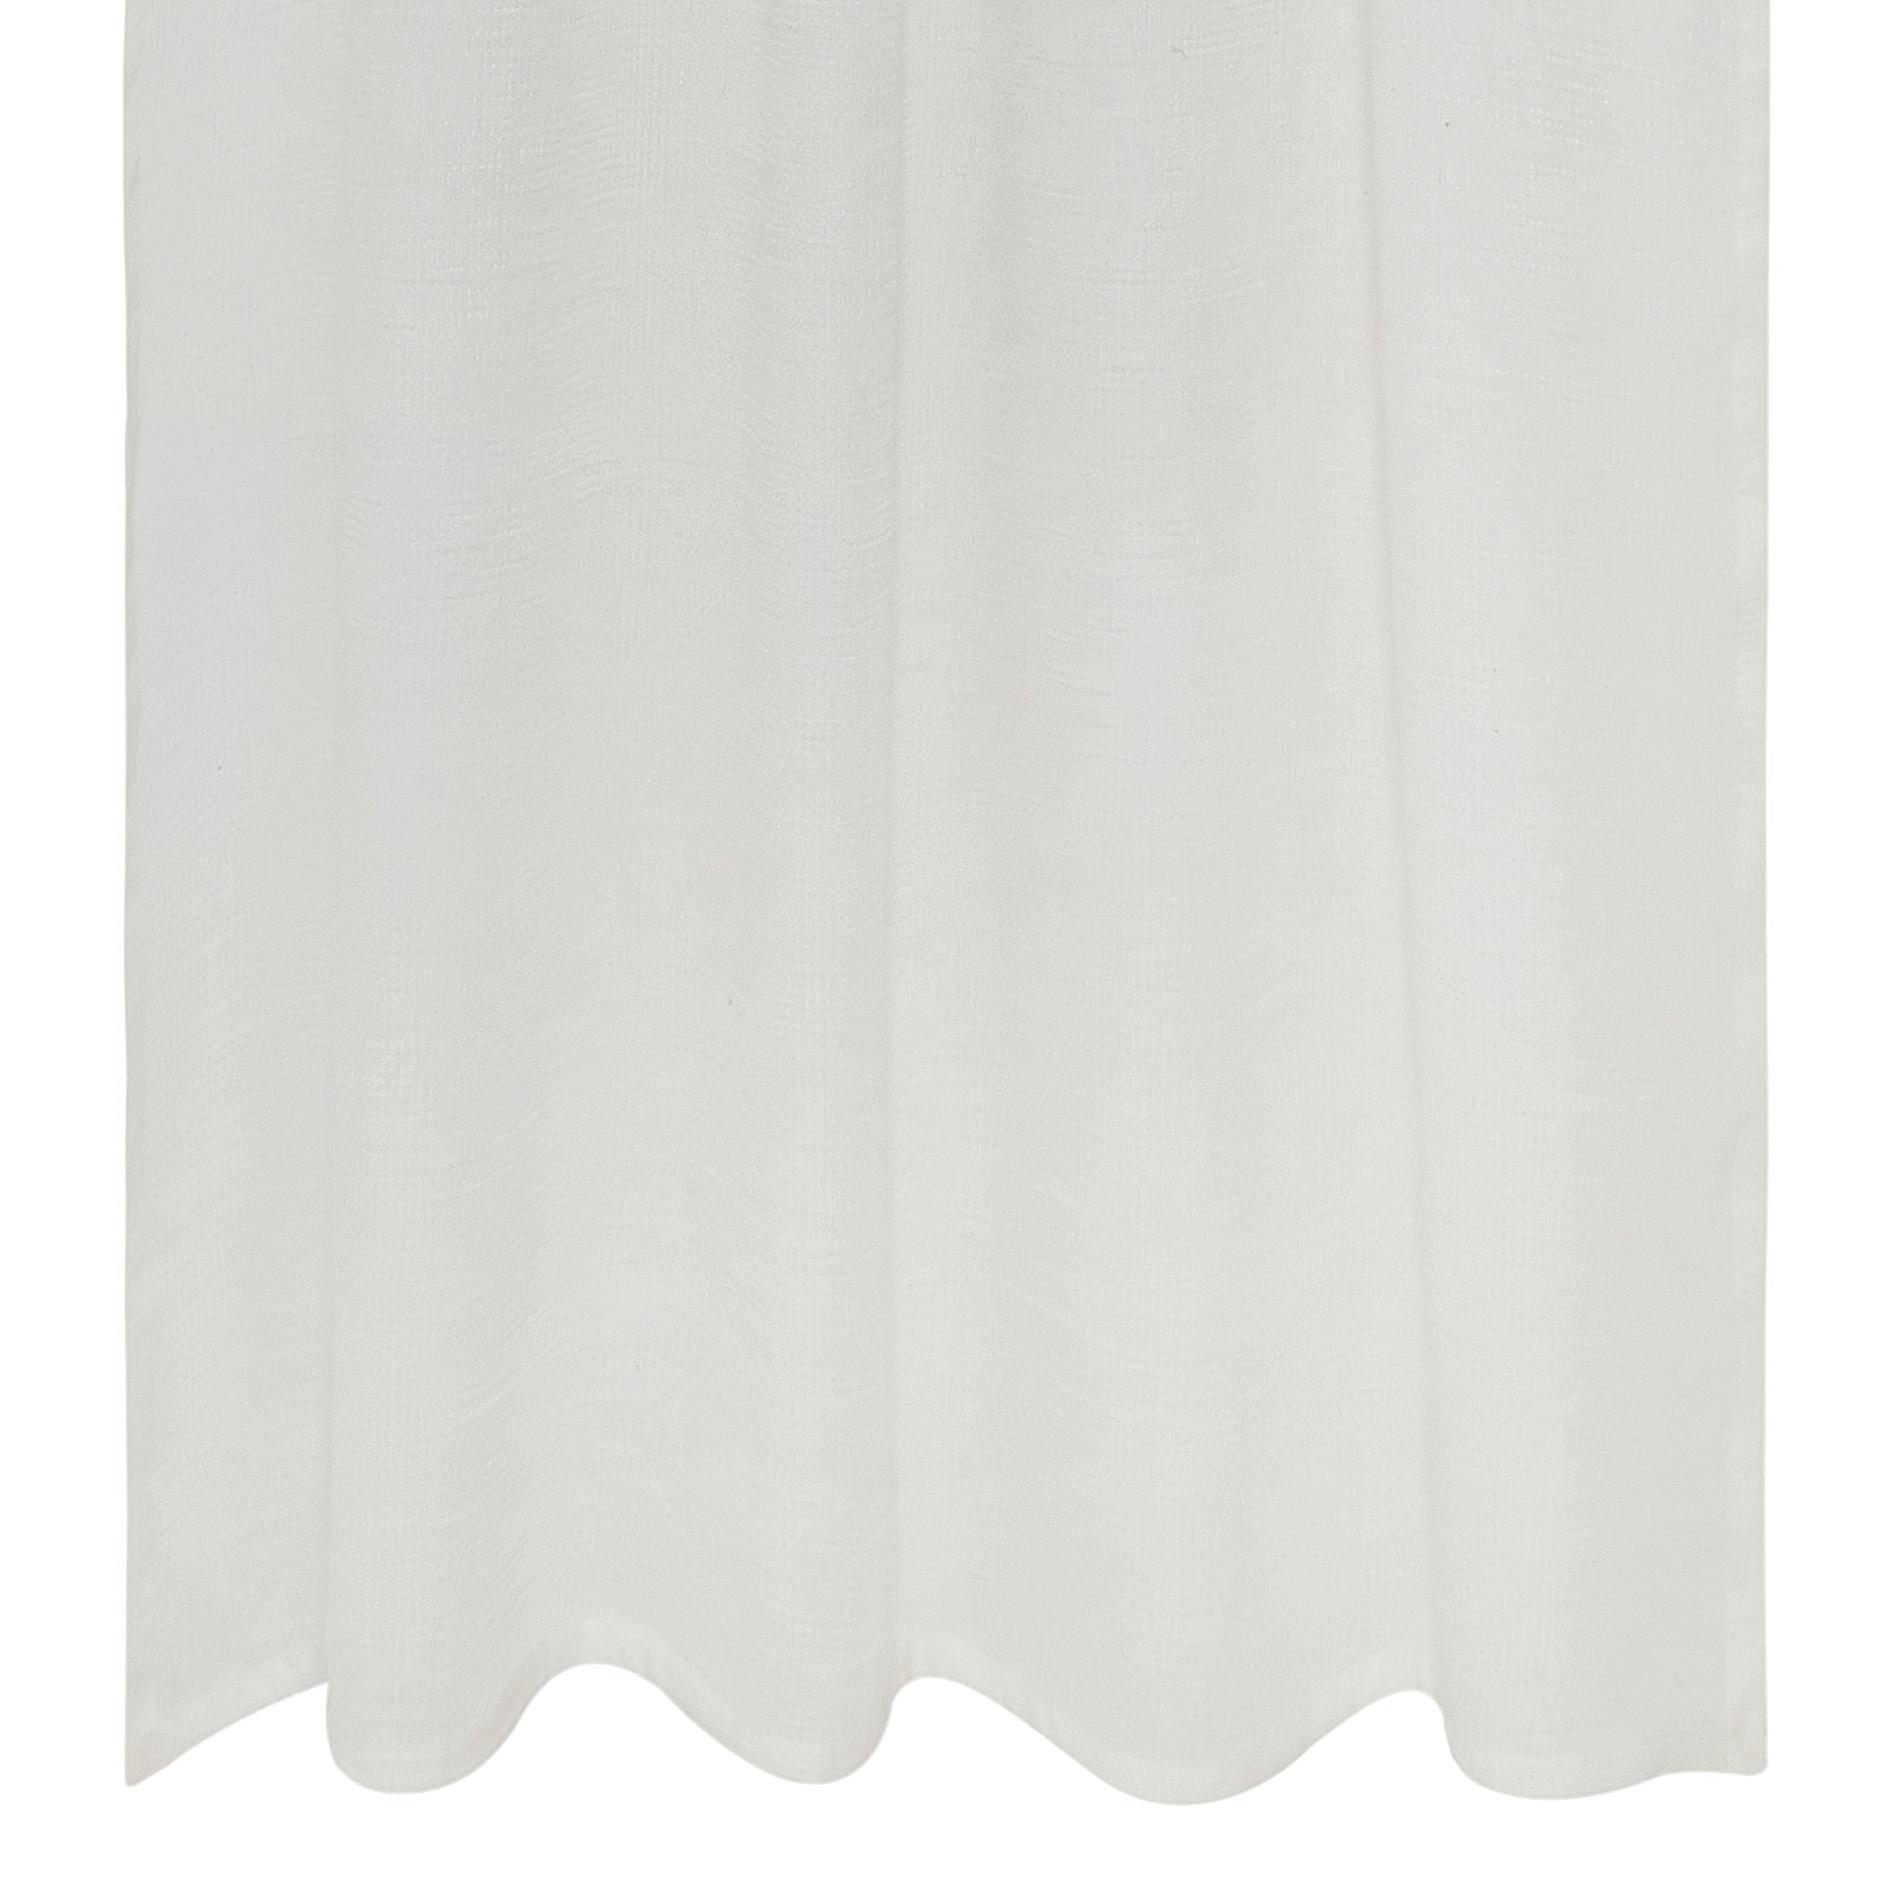 Tenda misto lino passanti nascosti, Bianco, large image number 1